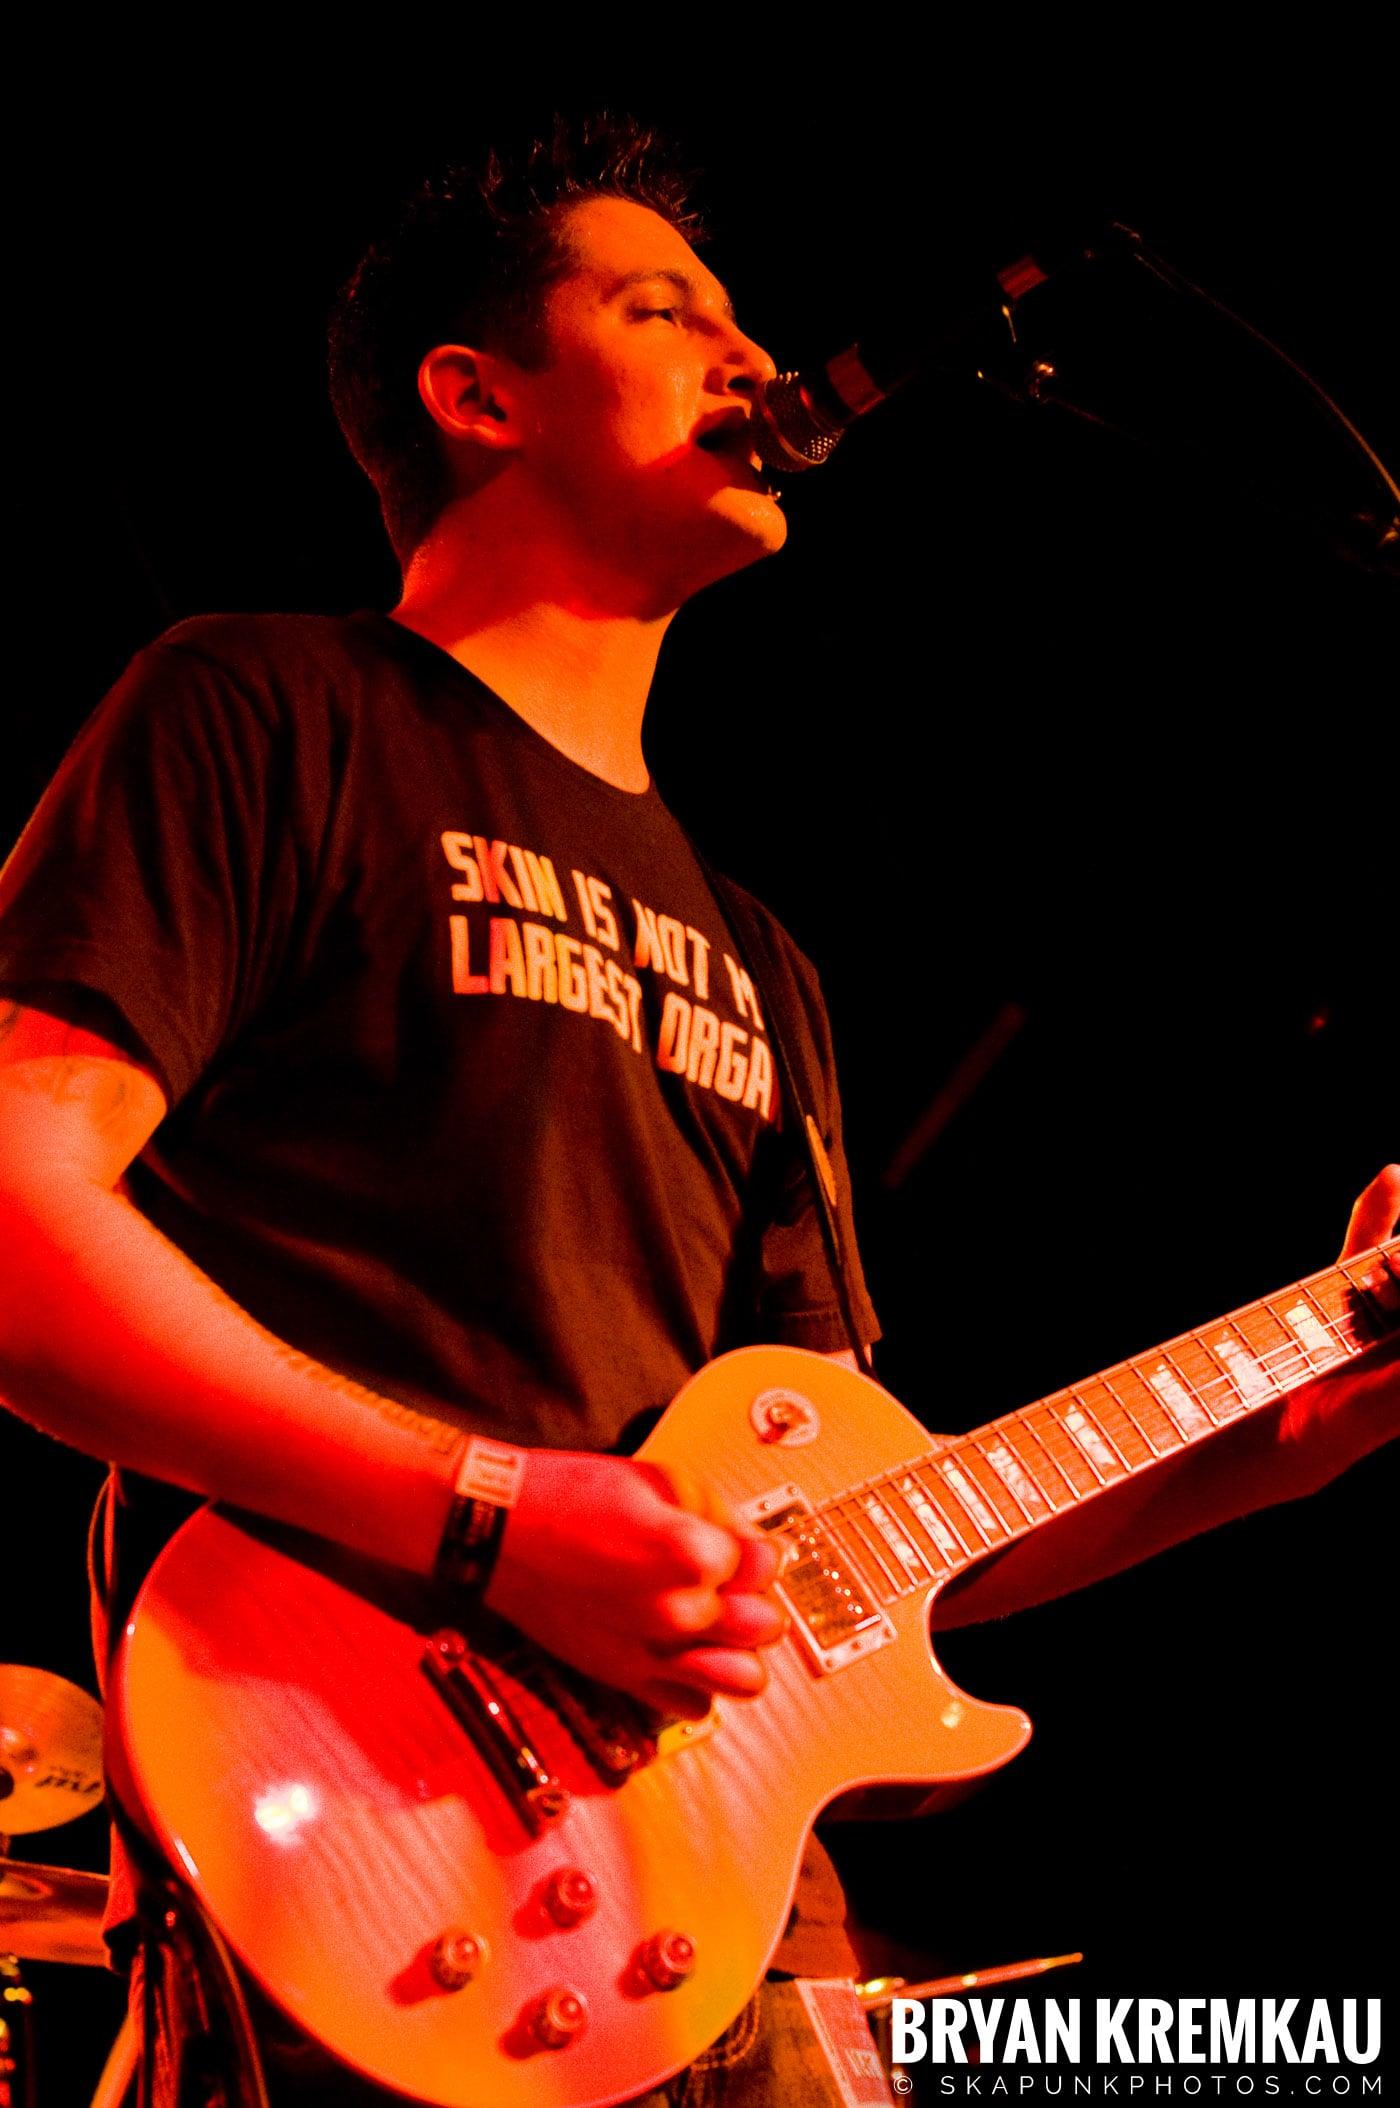 Avon Junkies (Ska is Dead Tour) @ Starland Ballroom, Sayreville, NJ - 11.15.09 (3)